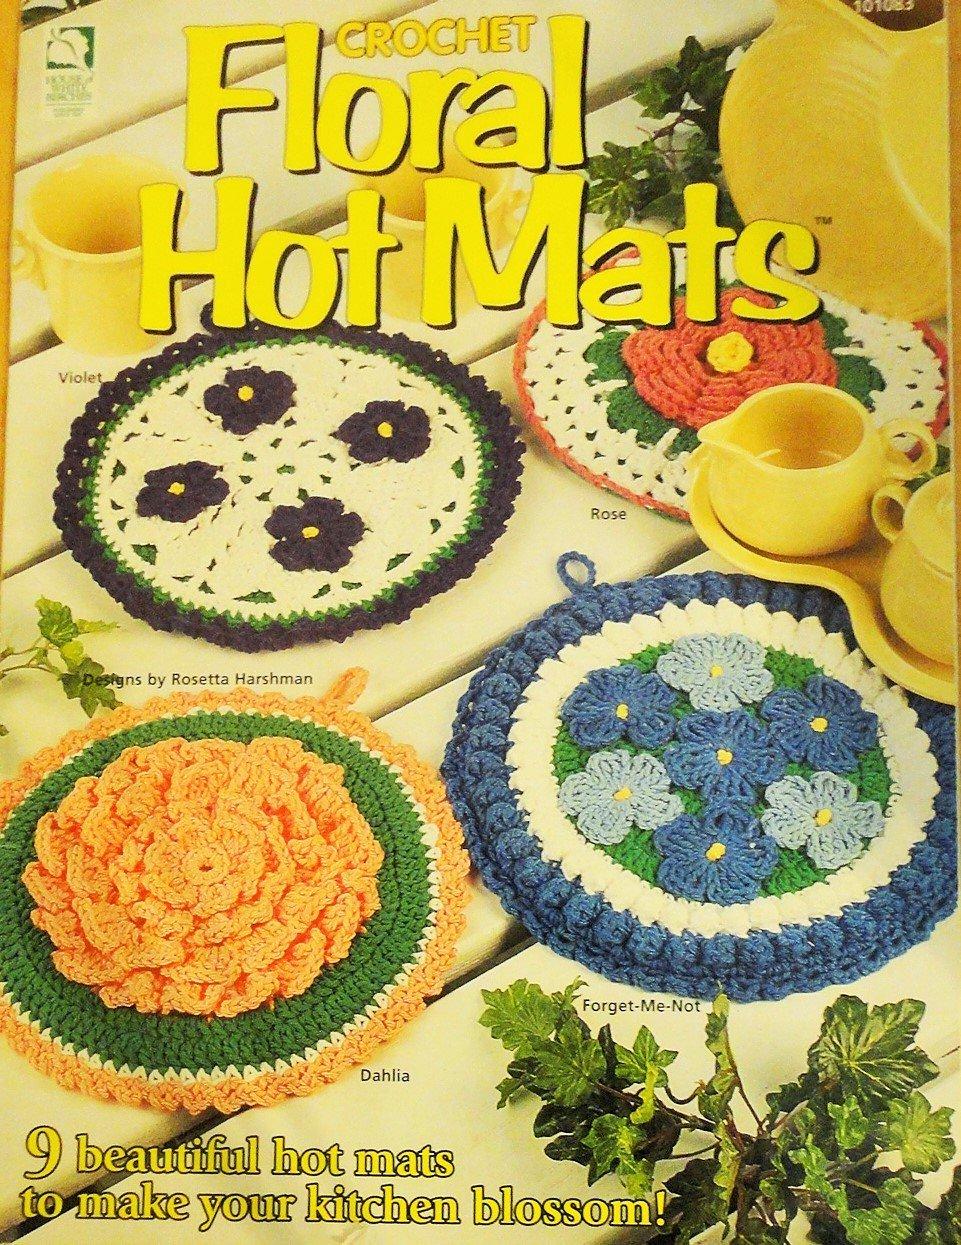 House of White Birches 101083 Crochet Floral Hot Mats Pot Holders